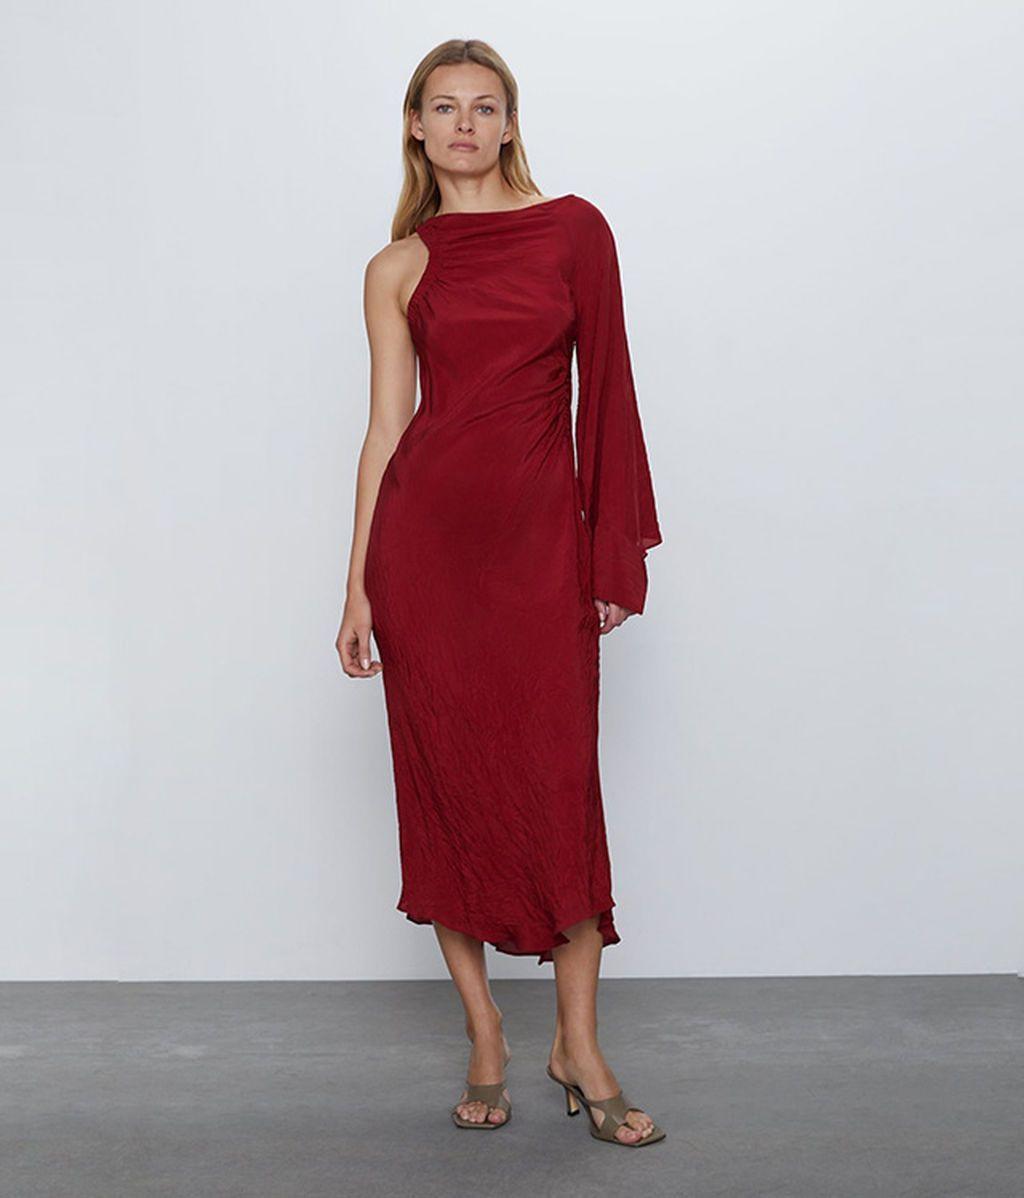 Vestido asimetrico de Zara